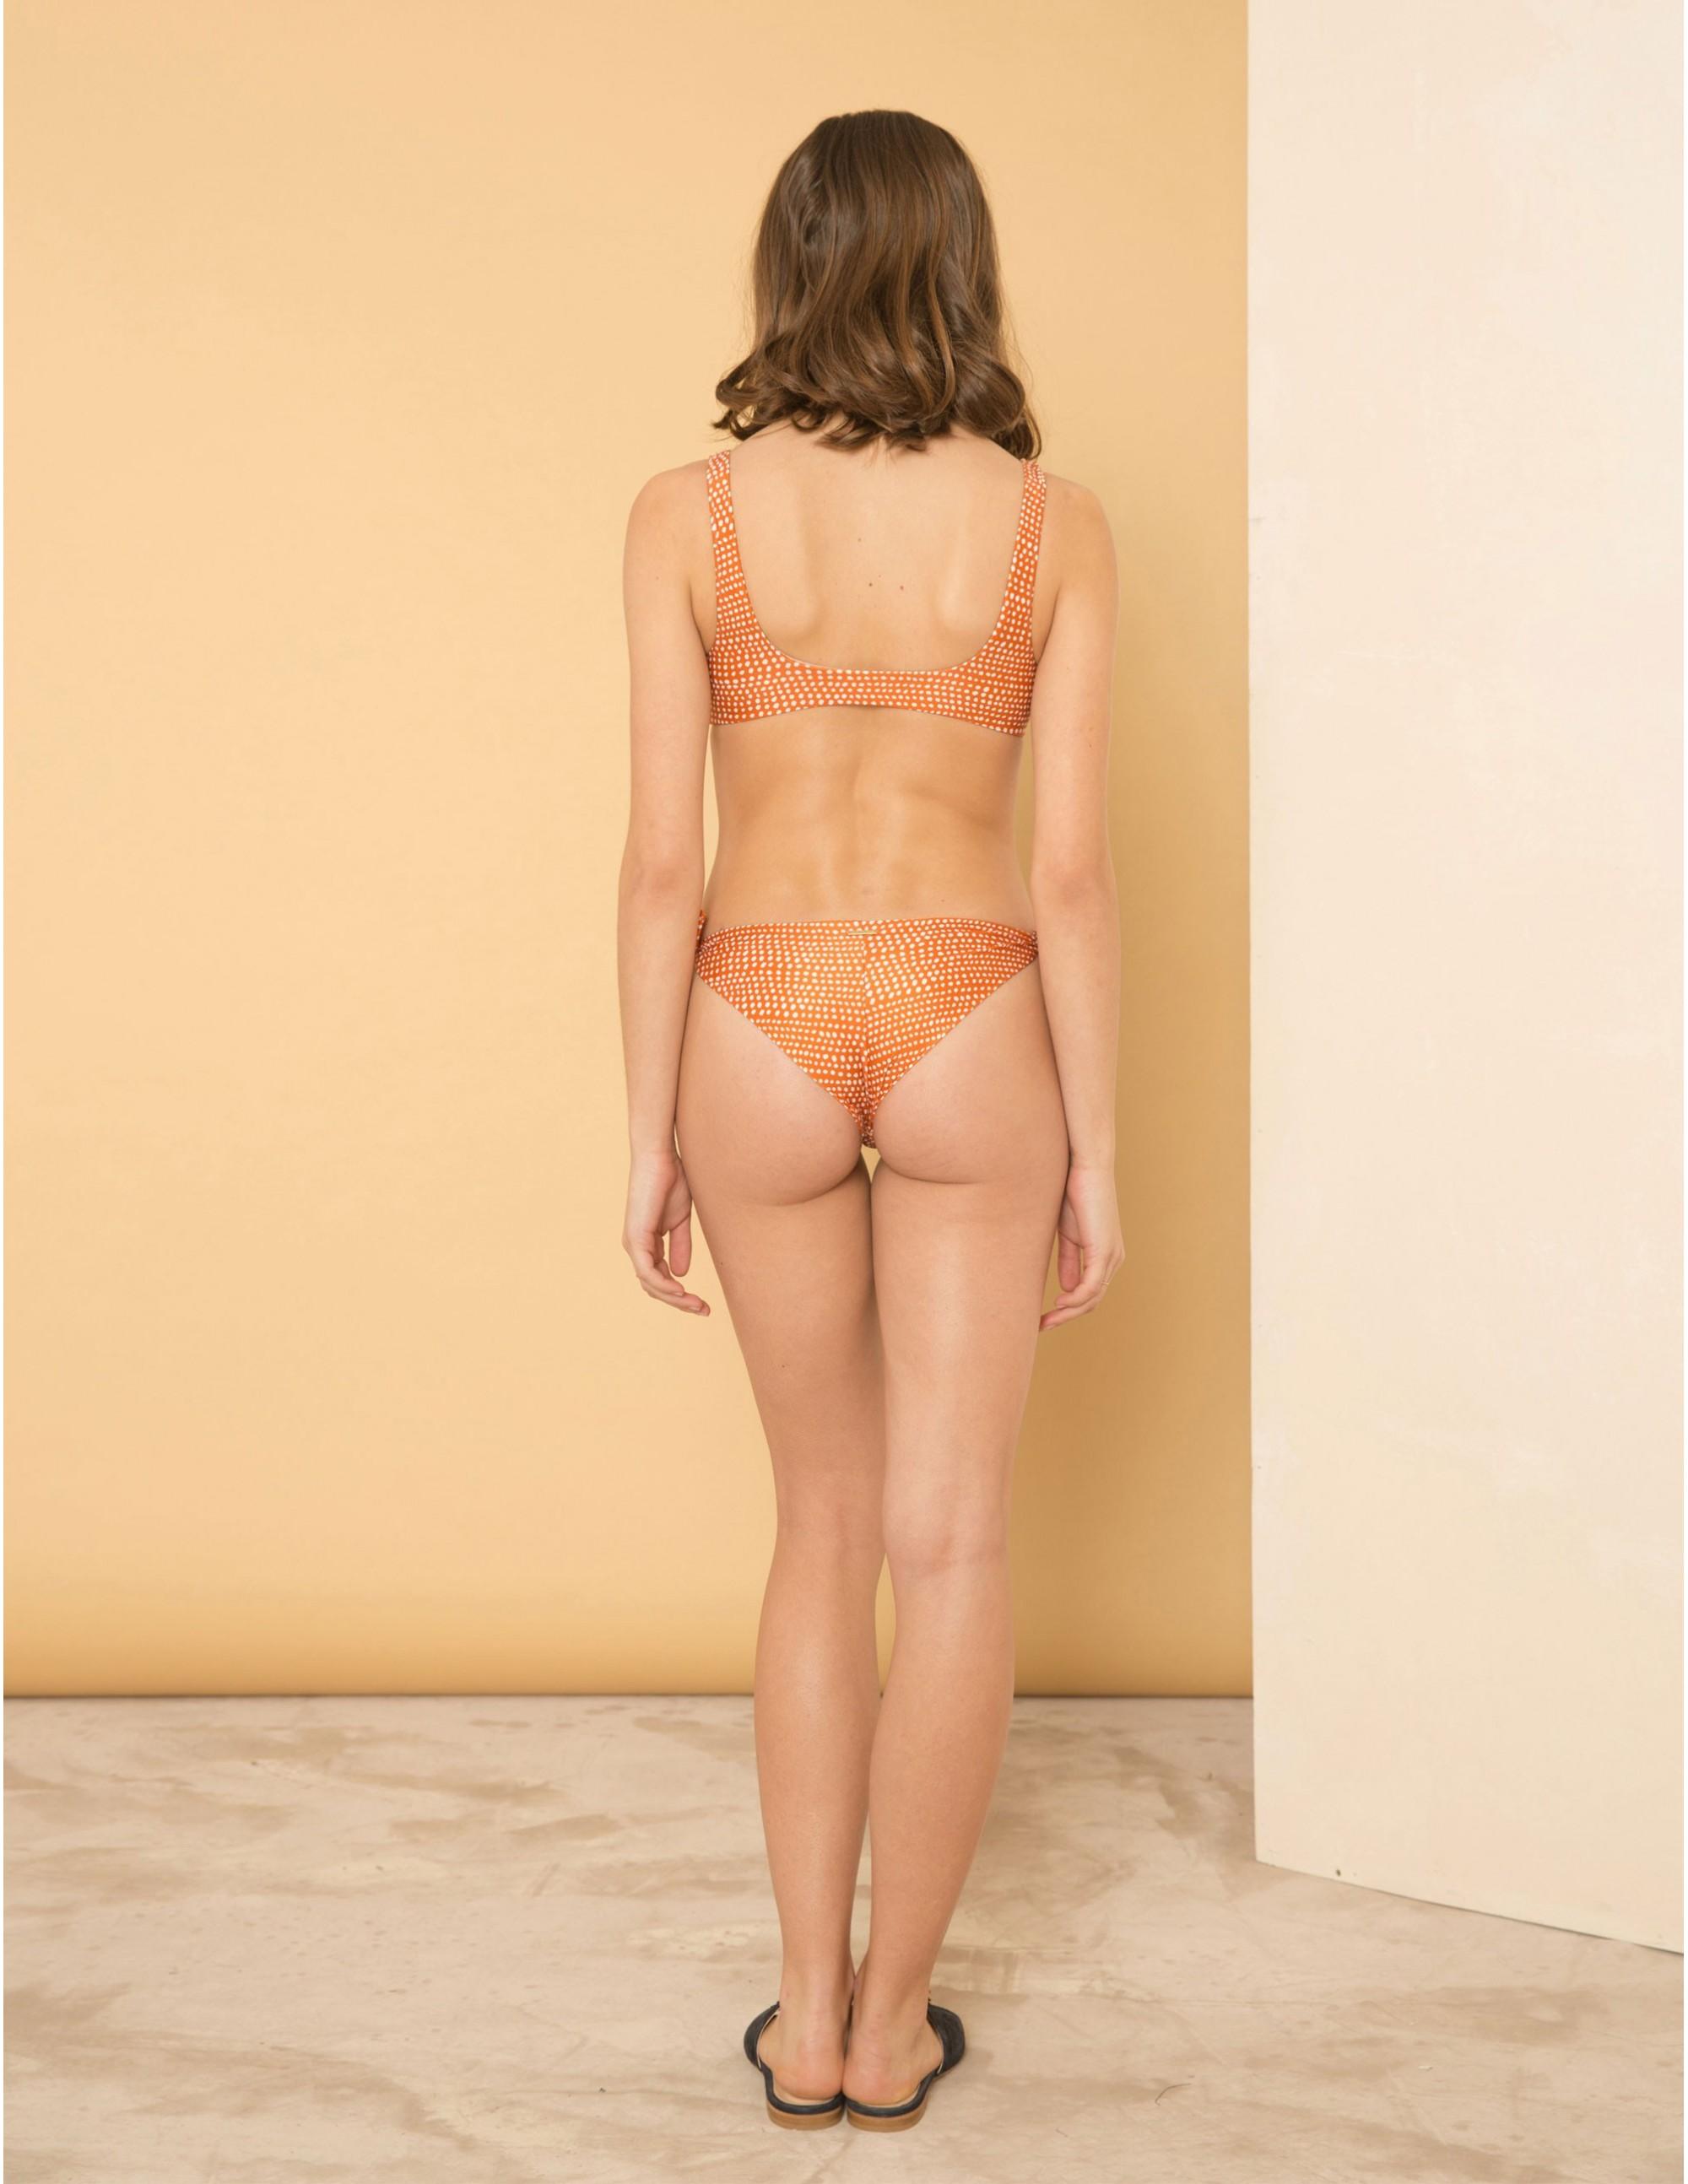 MISALI bikini top - CANDY FAWN